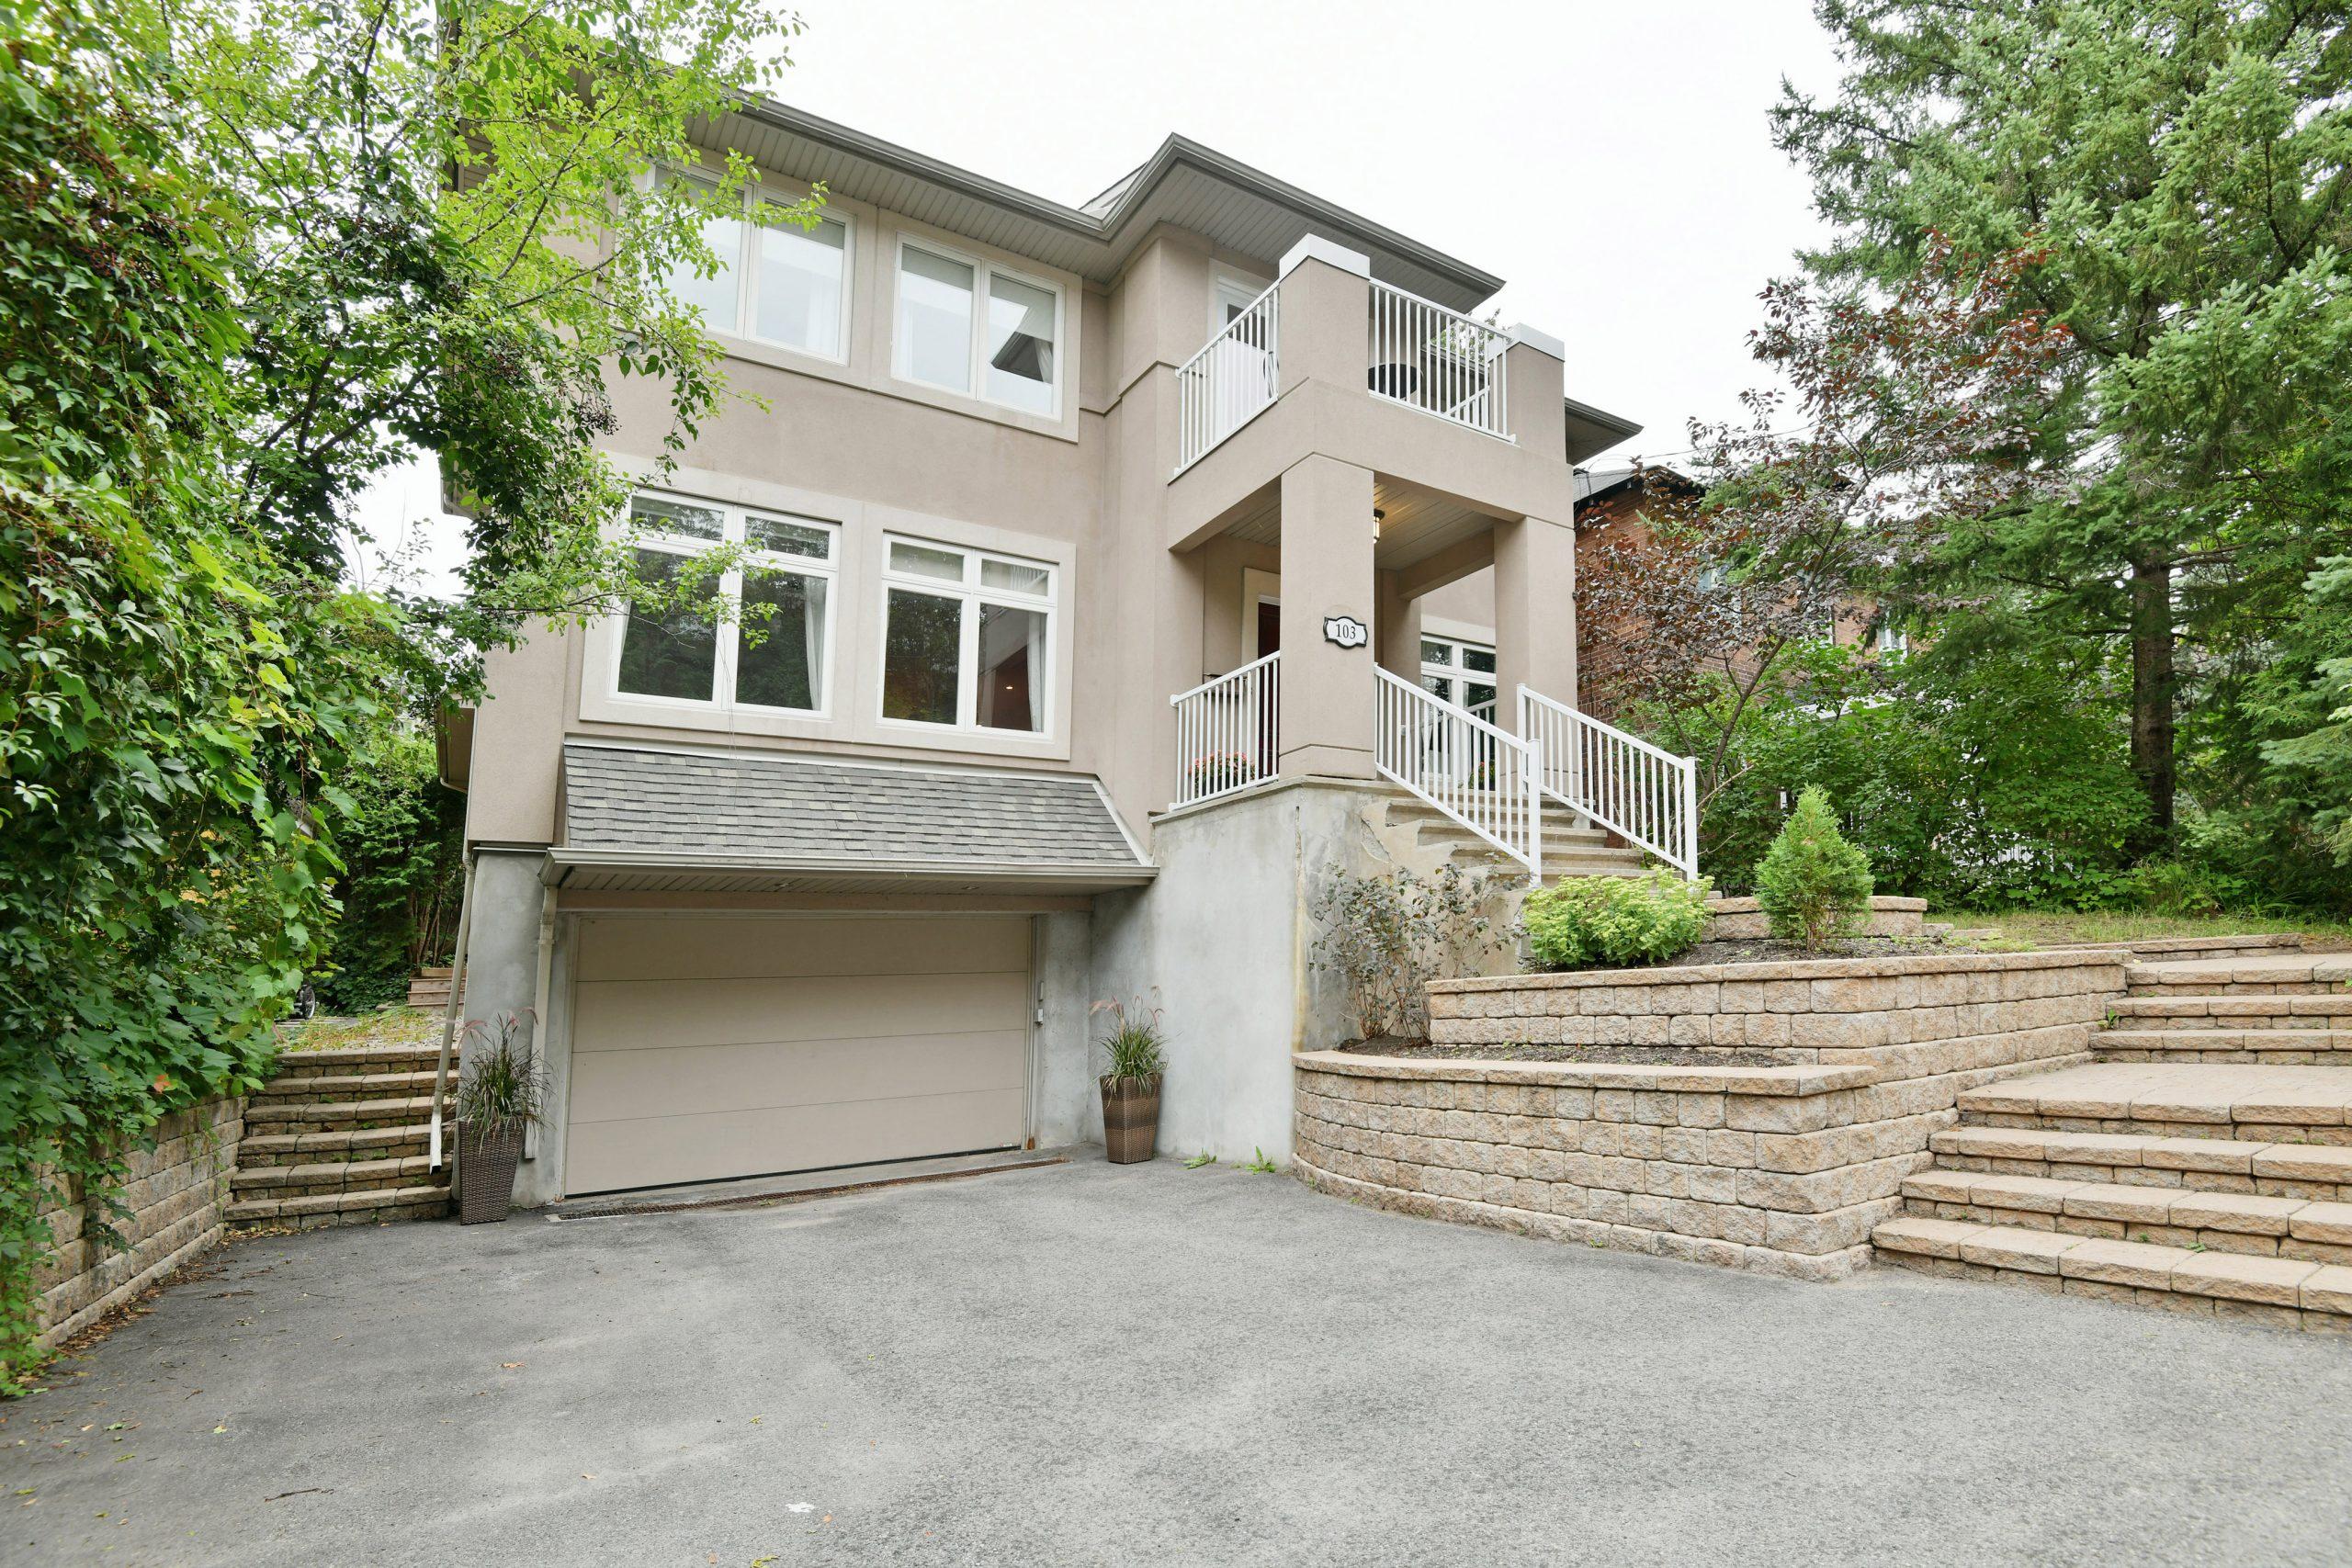 103 Rideau Terrace – Sold September 2020